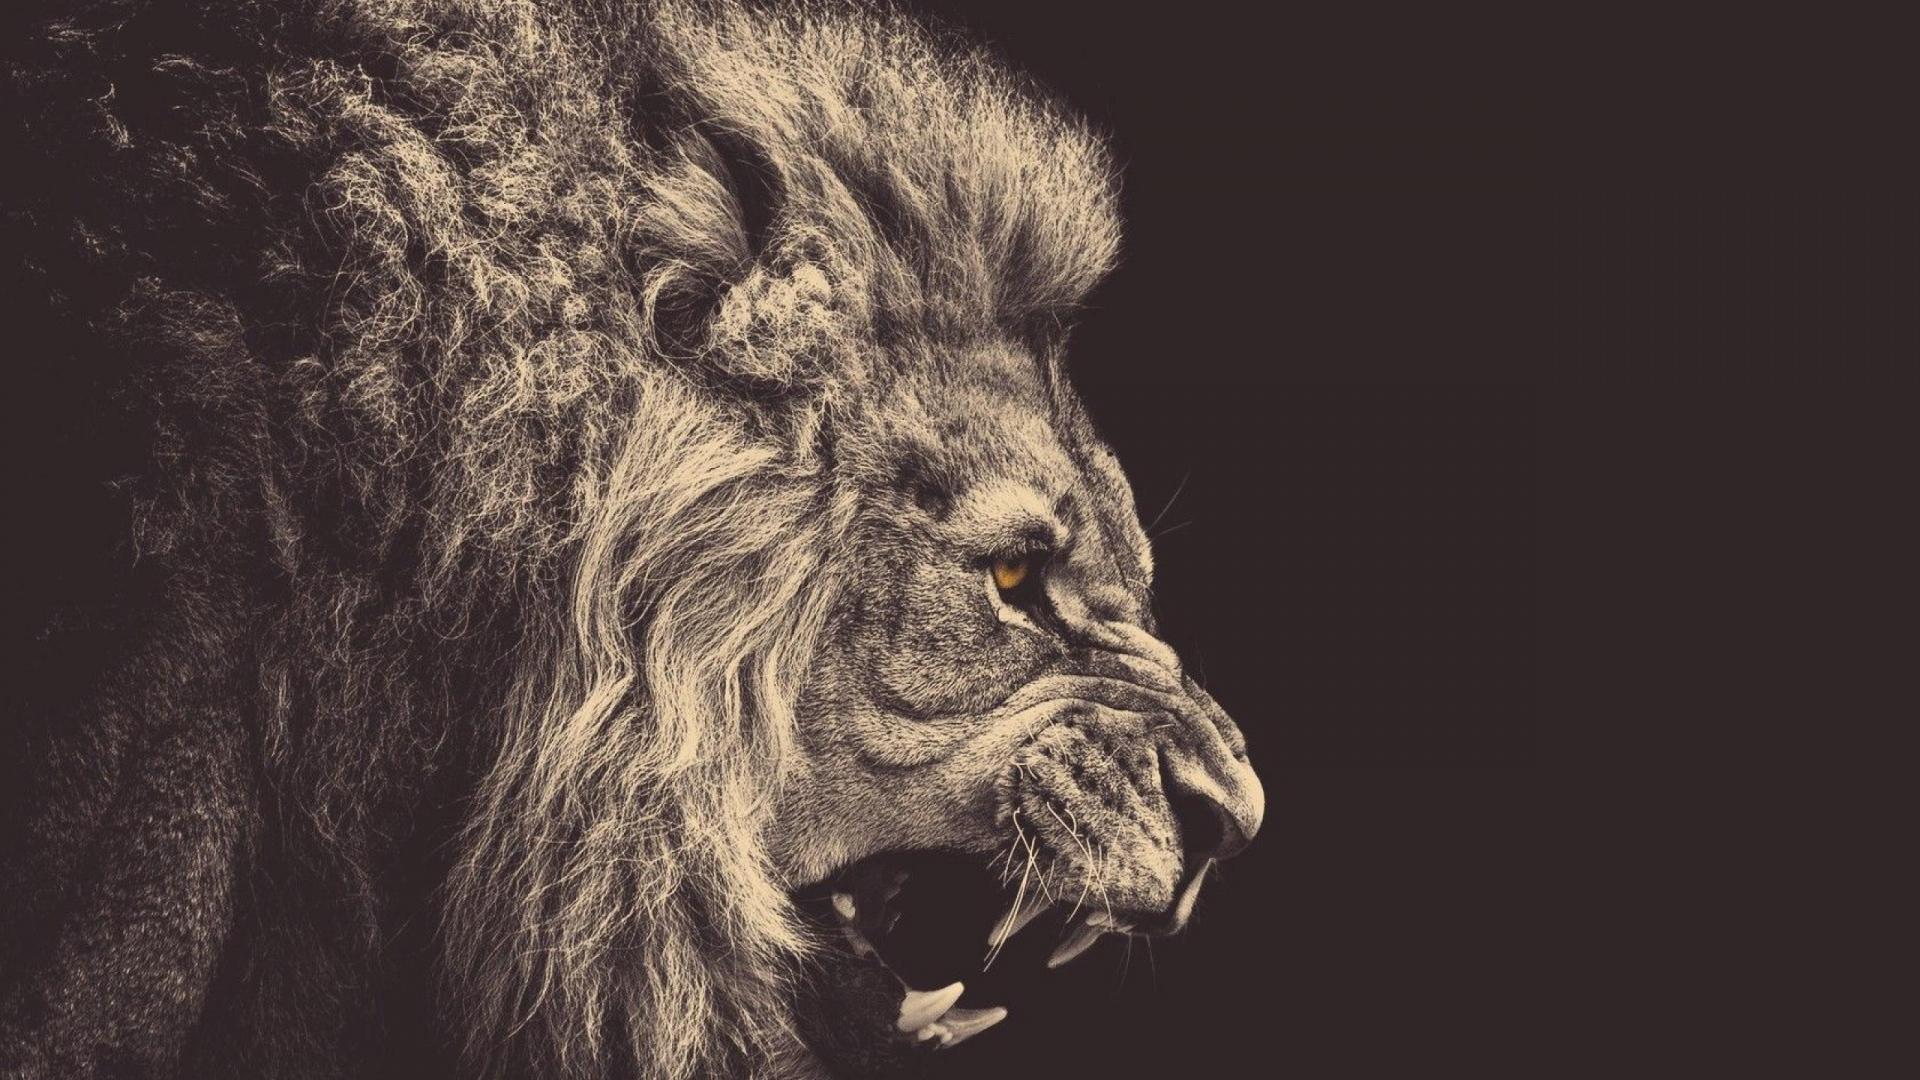 Full-HD-1080p-Animals-Desktop-Backgrounds-HD-Downloads-wallpaper-wp3406010